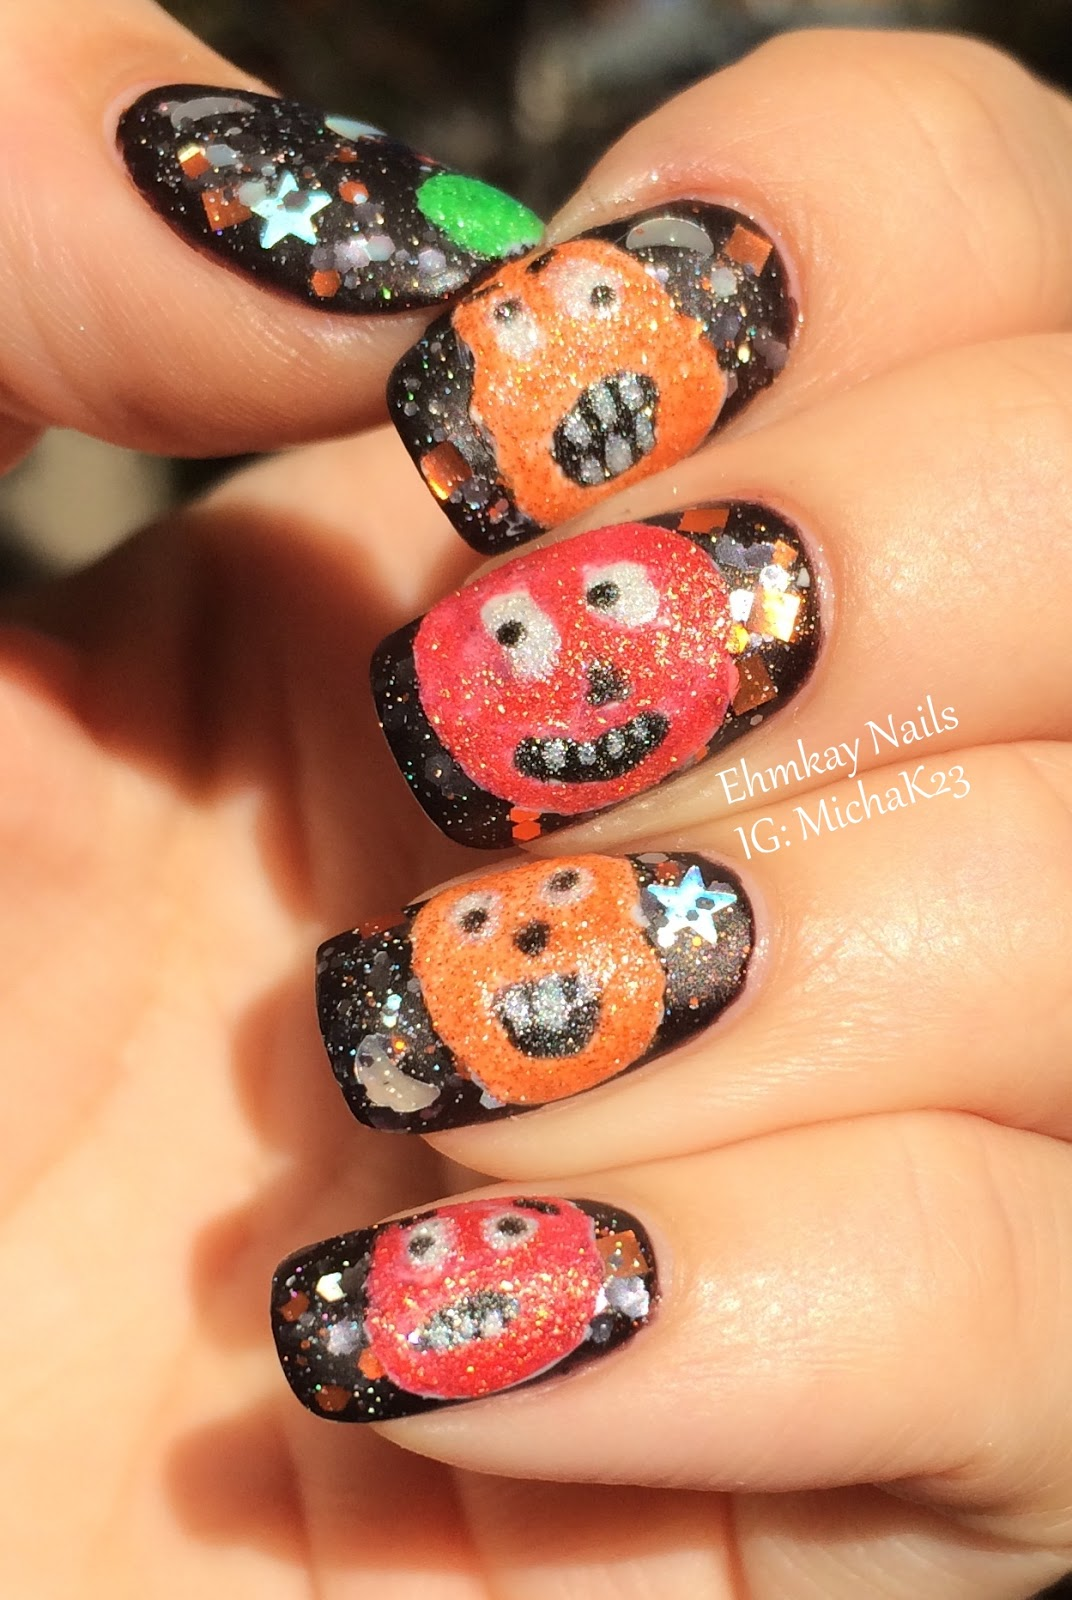 ehmkay nails: Halloween Nail Art Ideas